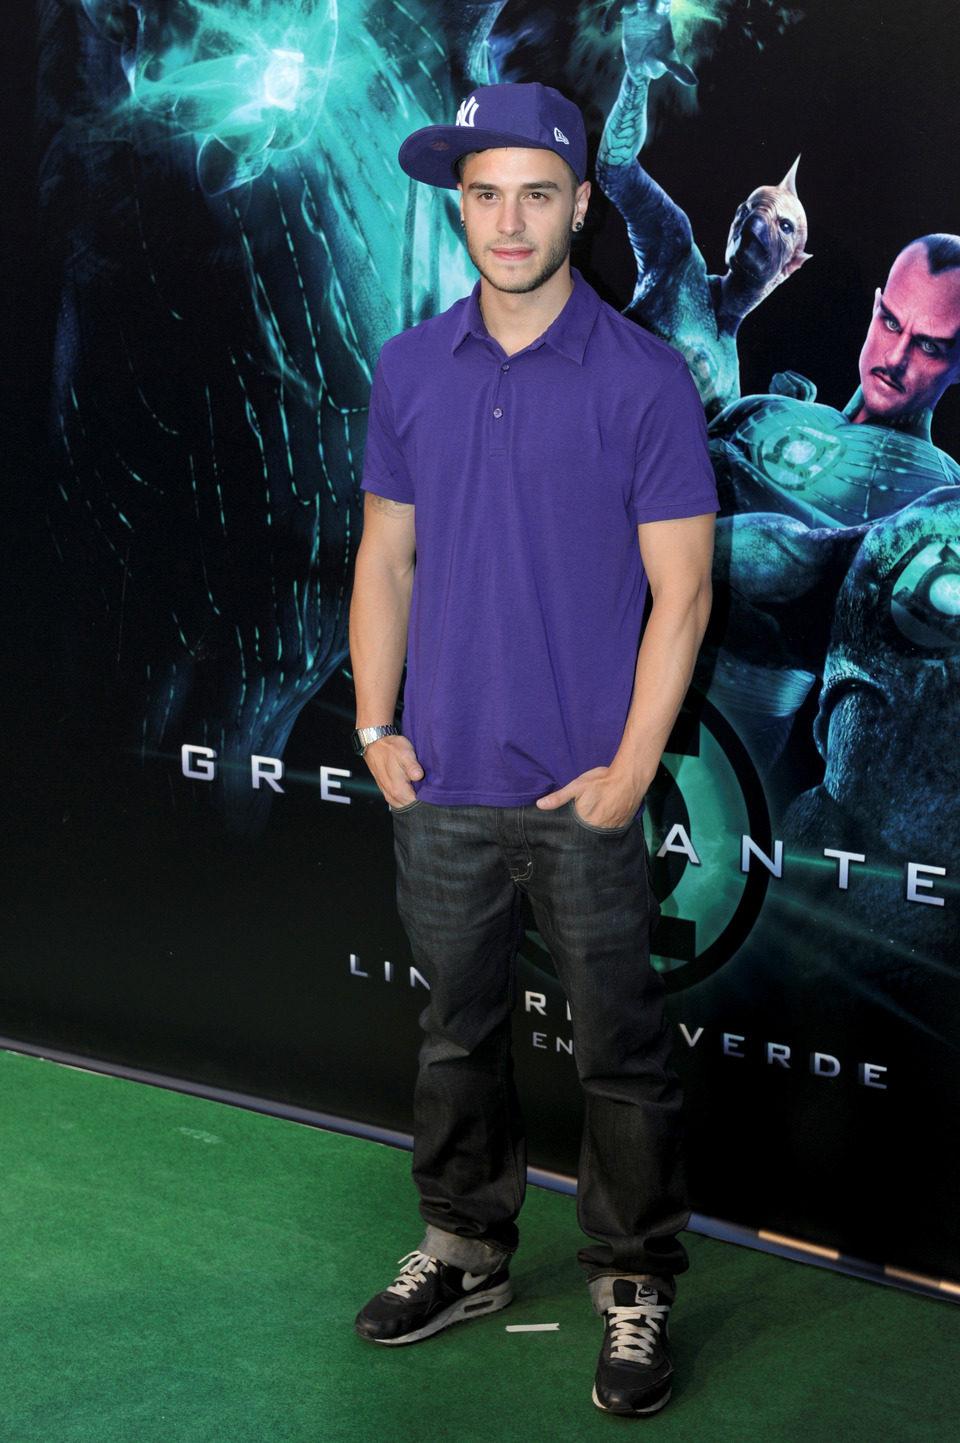 Green Lantern, fotograma 2 de 75